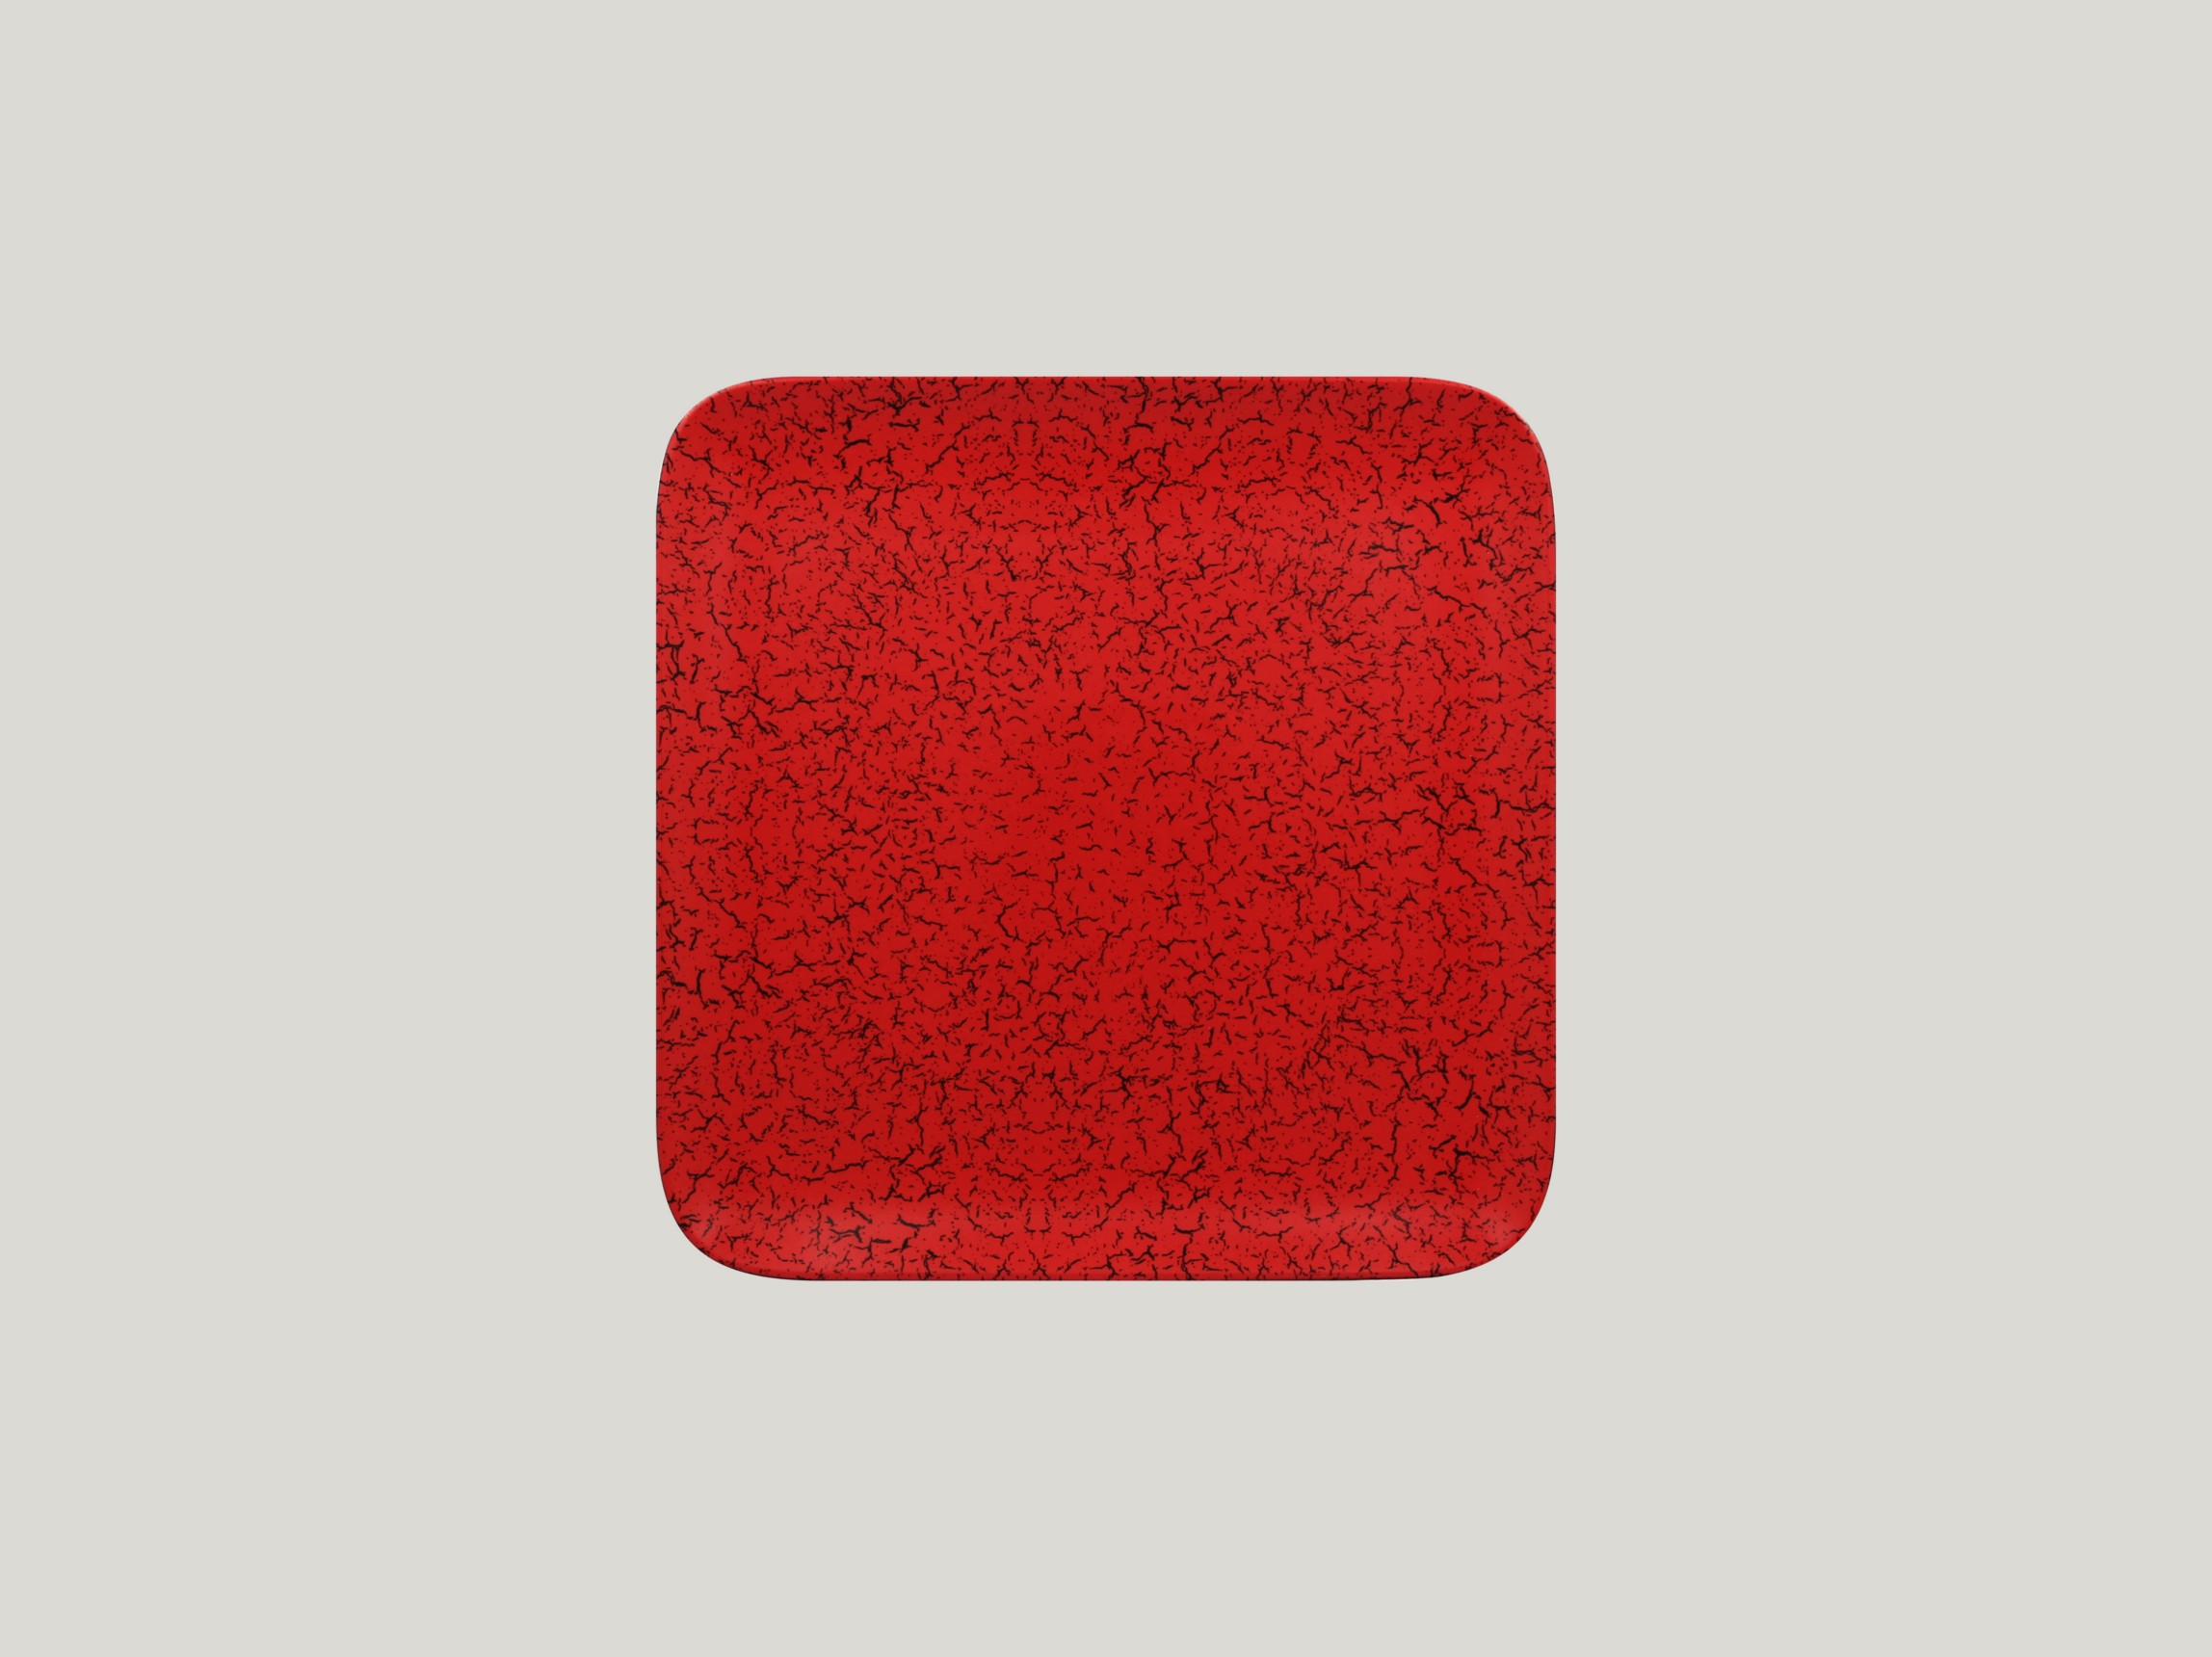 Talíř čtvercový 22 x 22 cm - červená